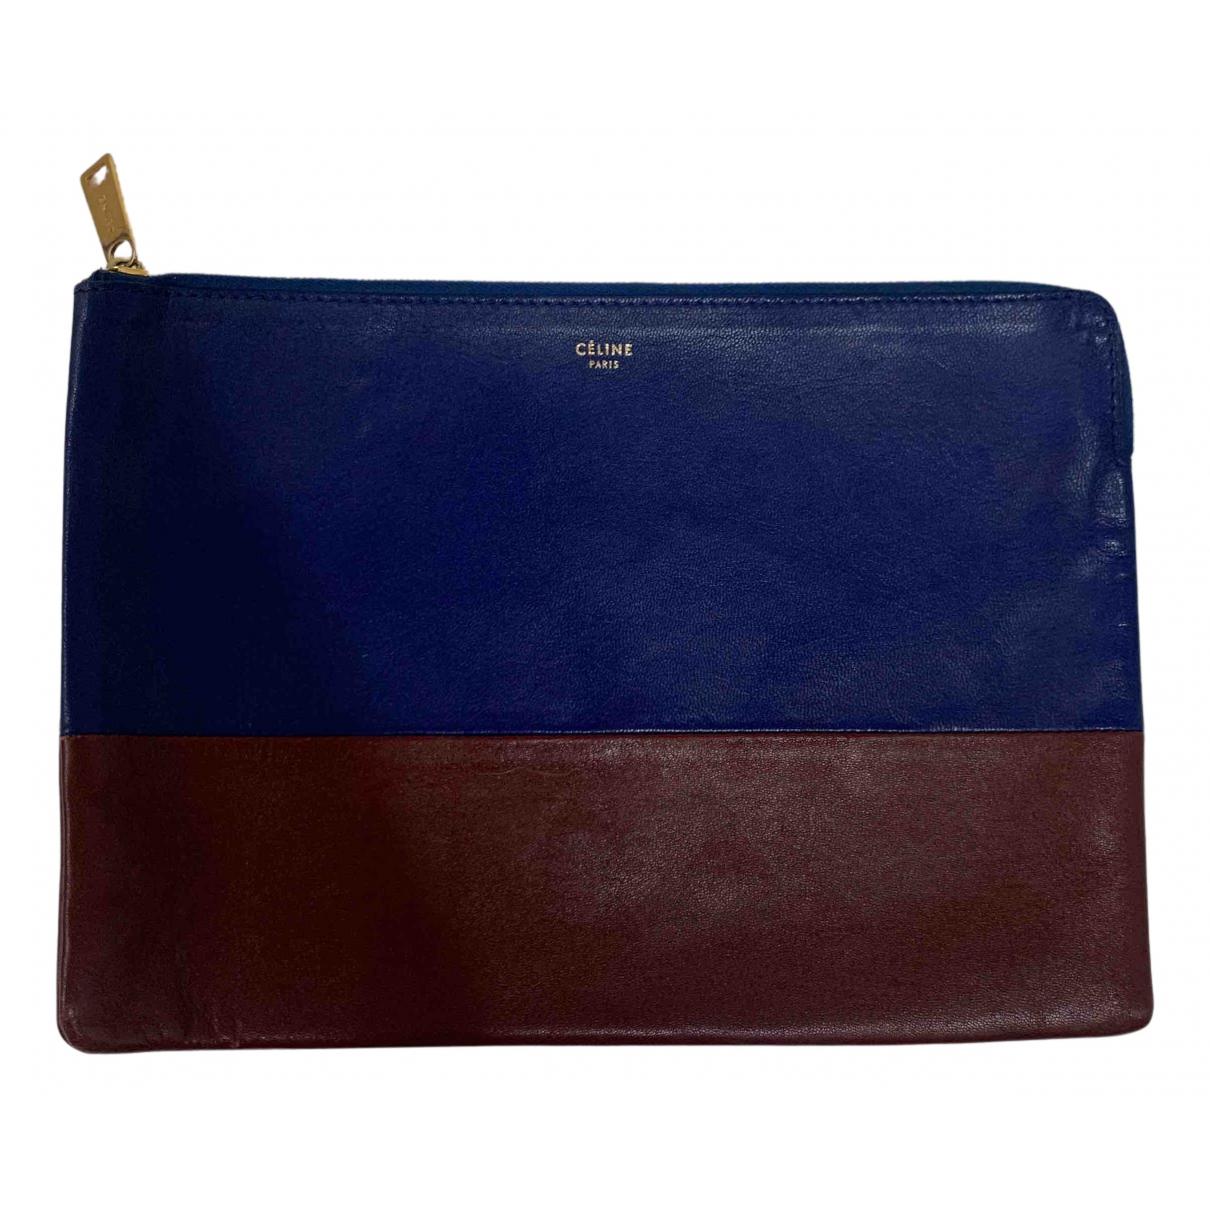 Celine N Blue Leather Clutch bag for Women N